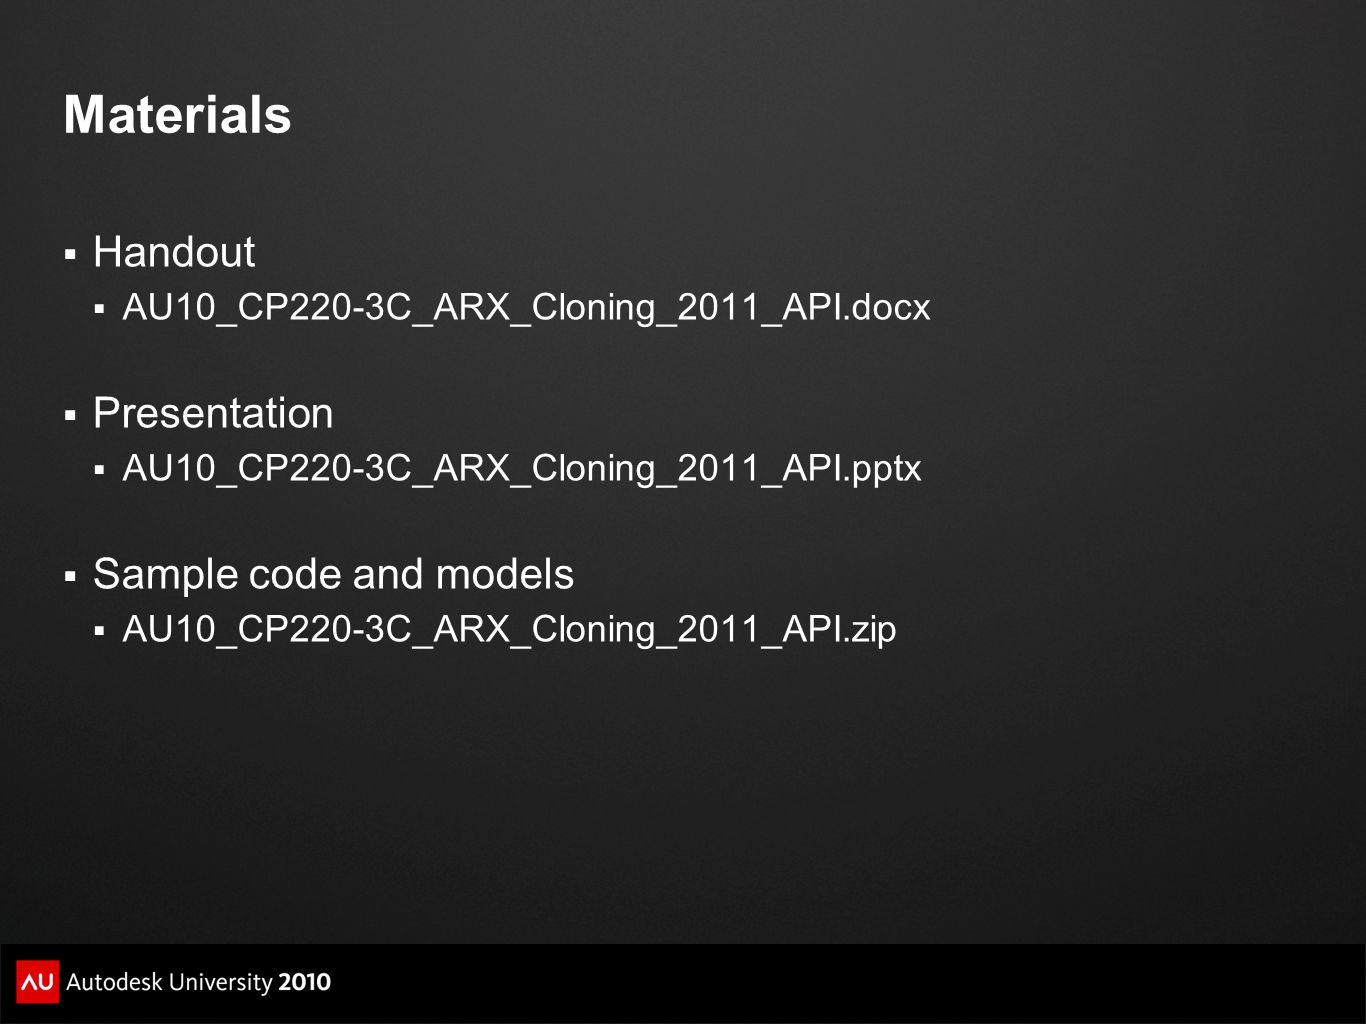 Materials  Handout  AU10_CP220-3C_ARX_Cloning_2011_API.docx  Presentation  AU10_CP220-3C_ARX_Cloning_2011_API.pptx  Sample code and models  AU10